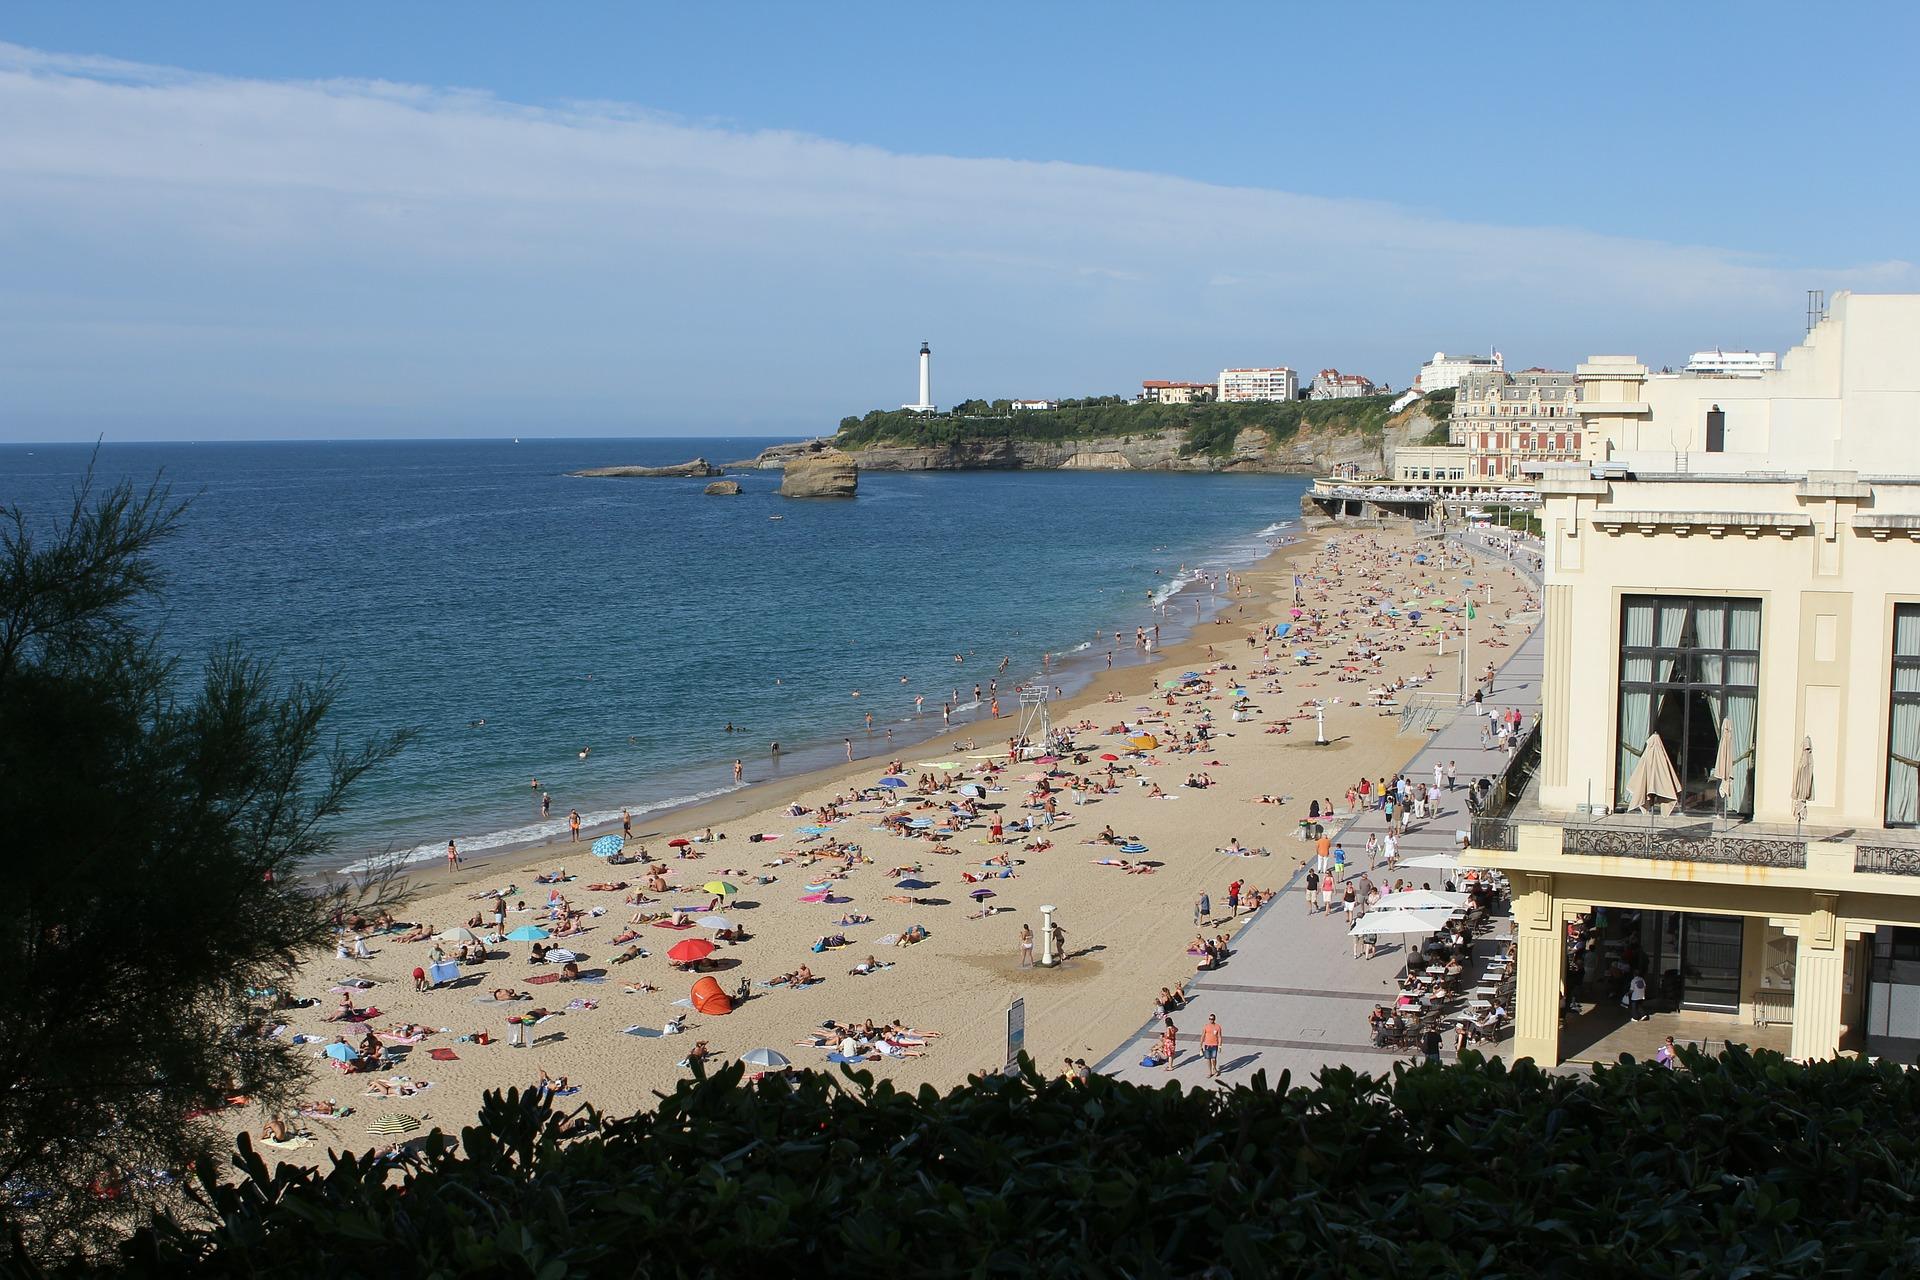 Agence Biarritz